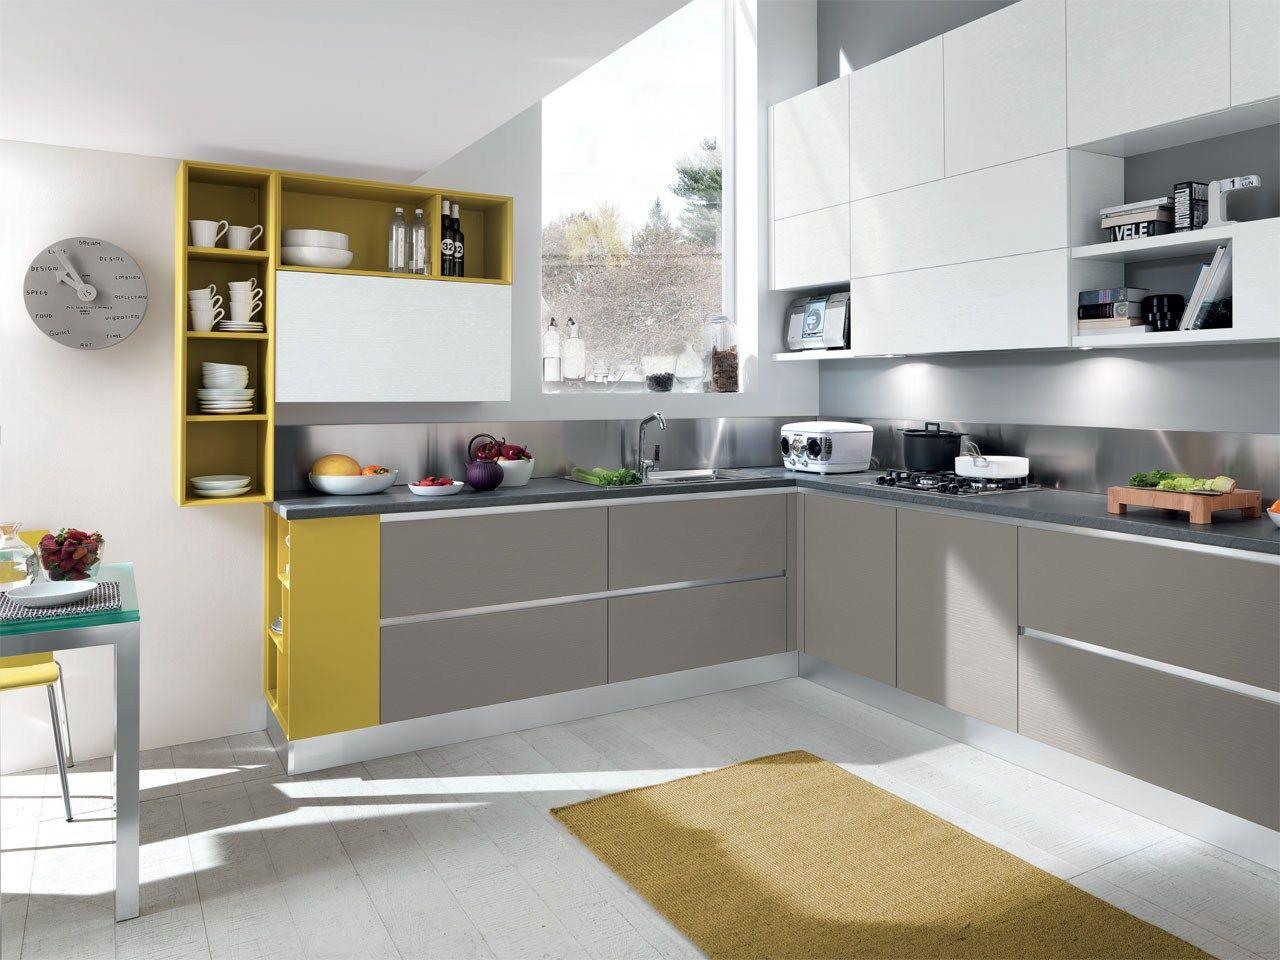 Cucina componibile in legno senza maniglie | Accessori cucina ...